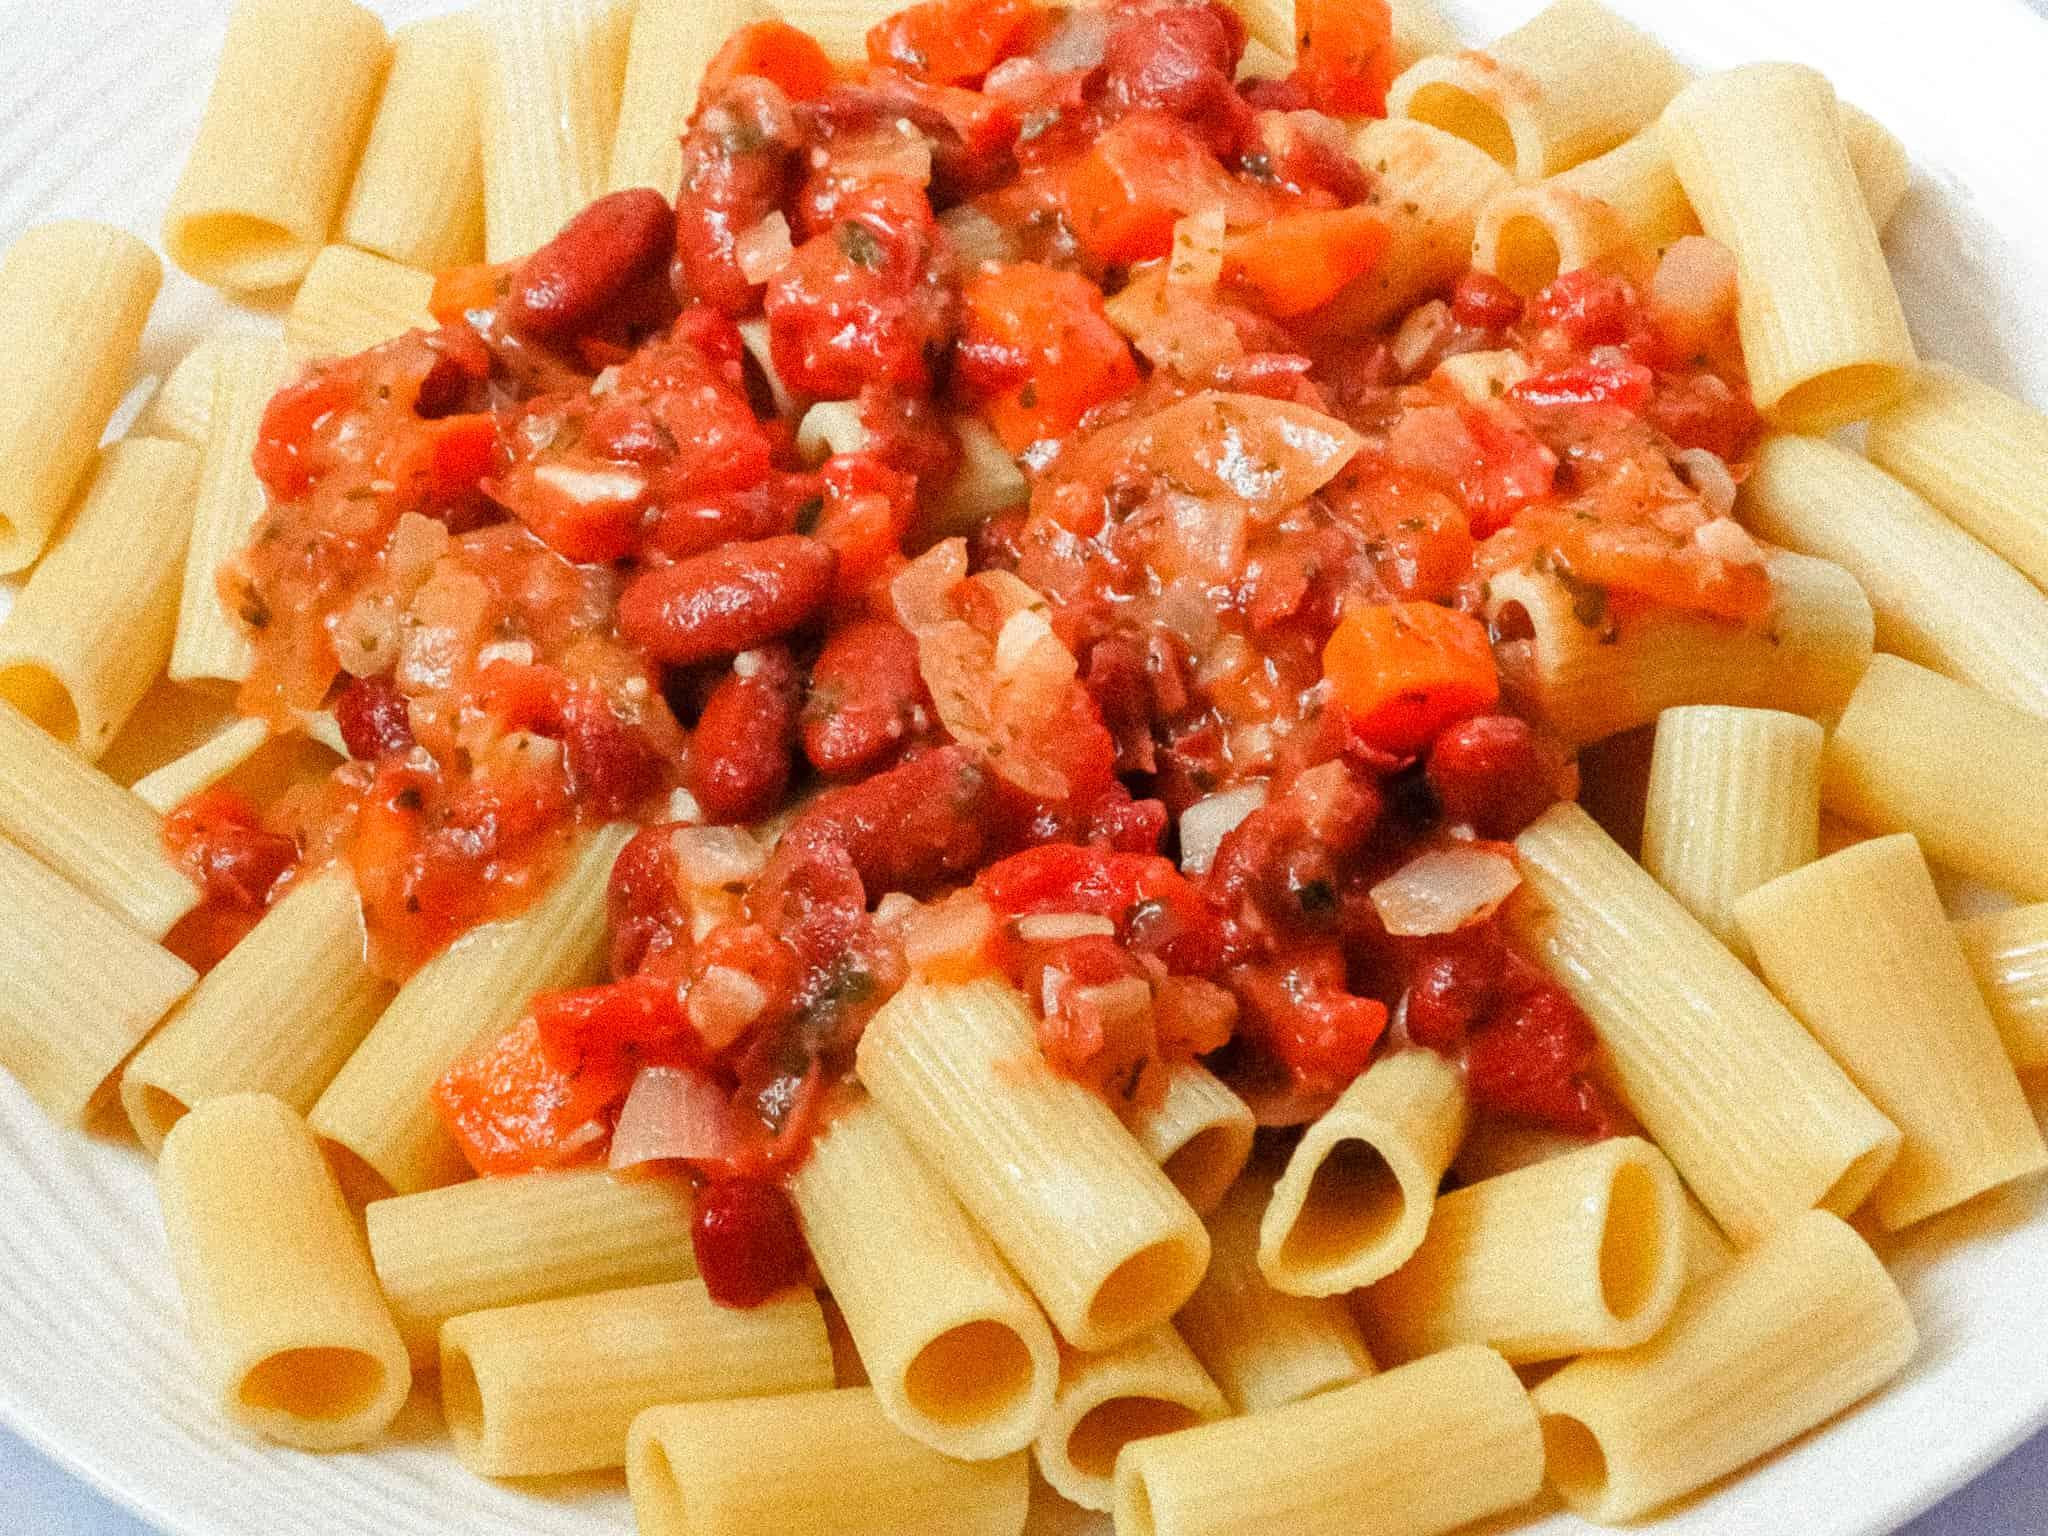 vegetarian bolognese sauce and rigatoni pasta